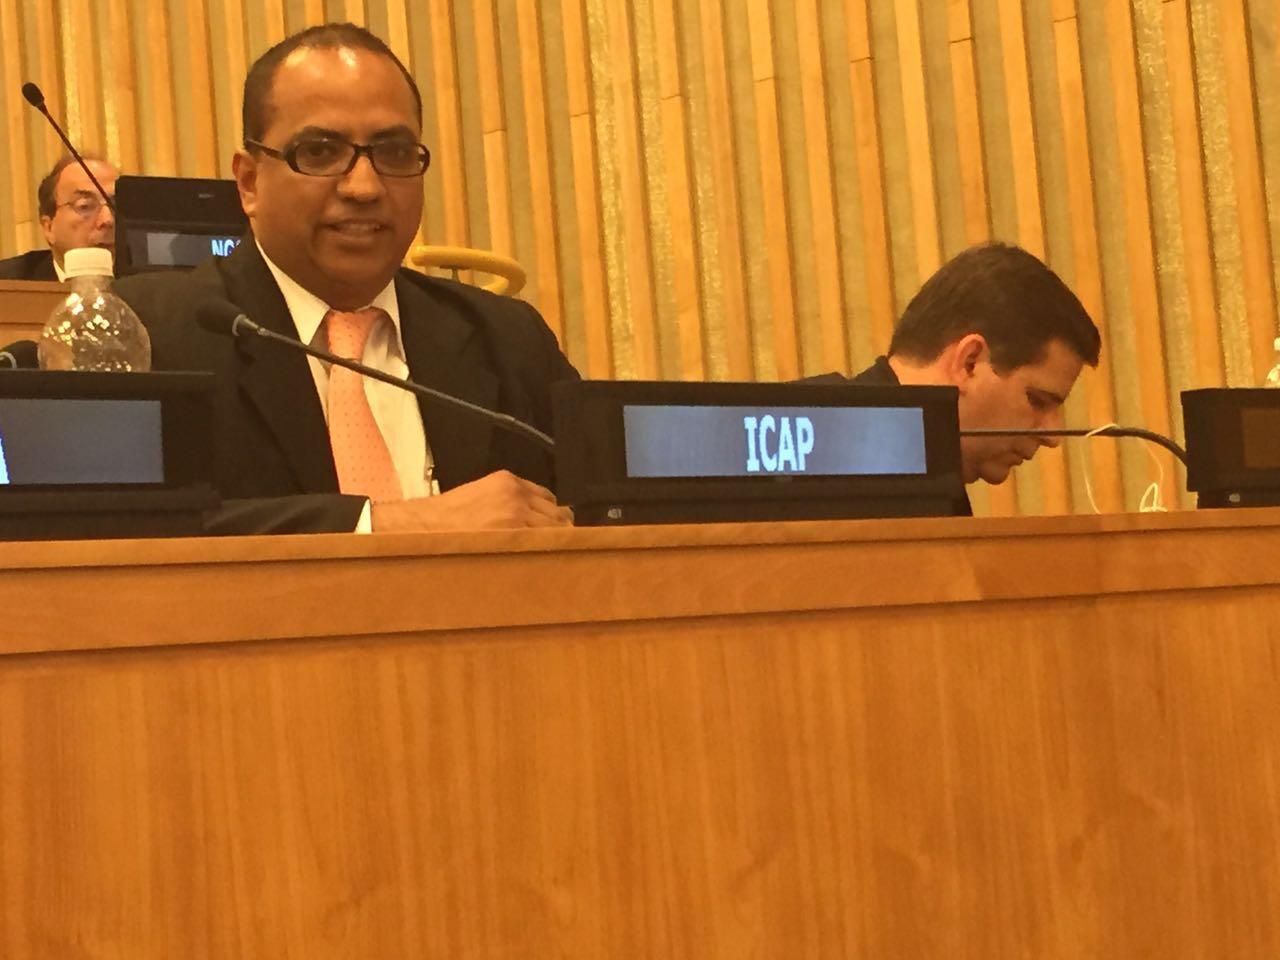 ICAP participa en reunión de expertos en Administración Pública